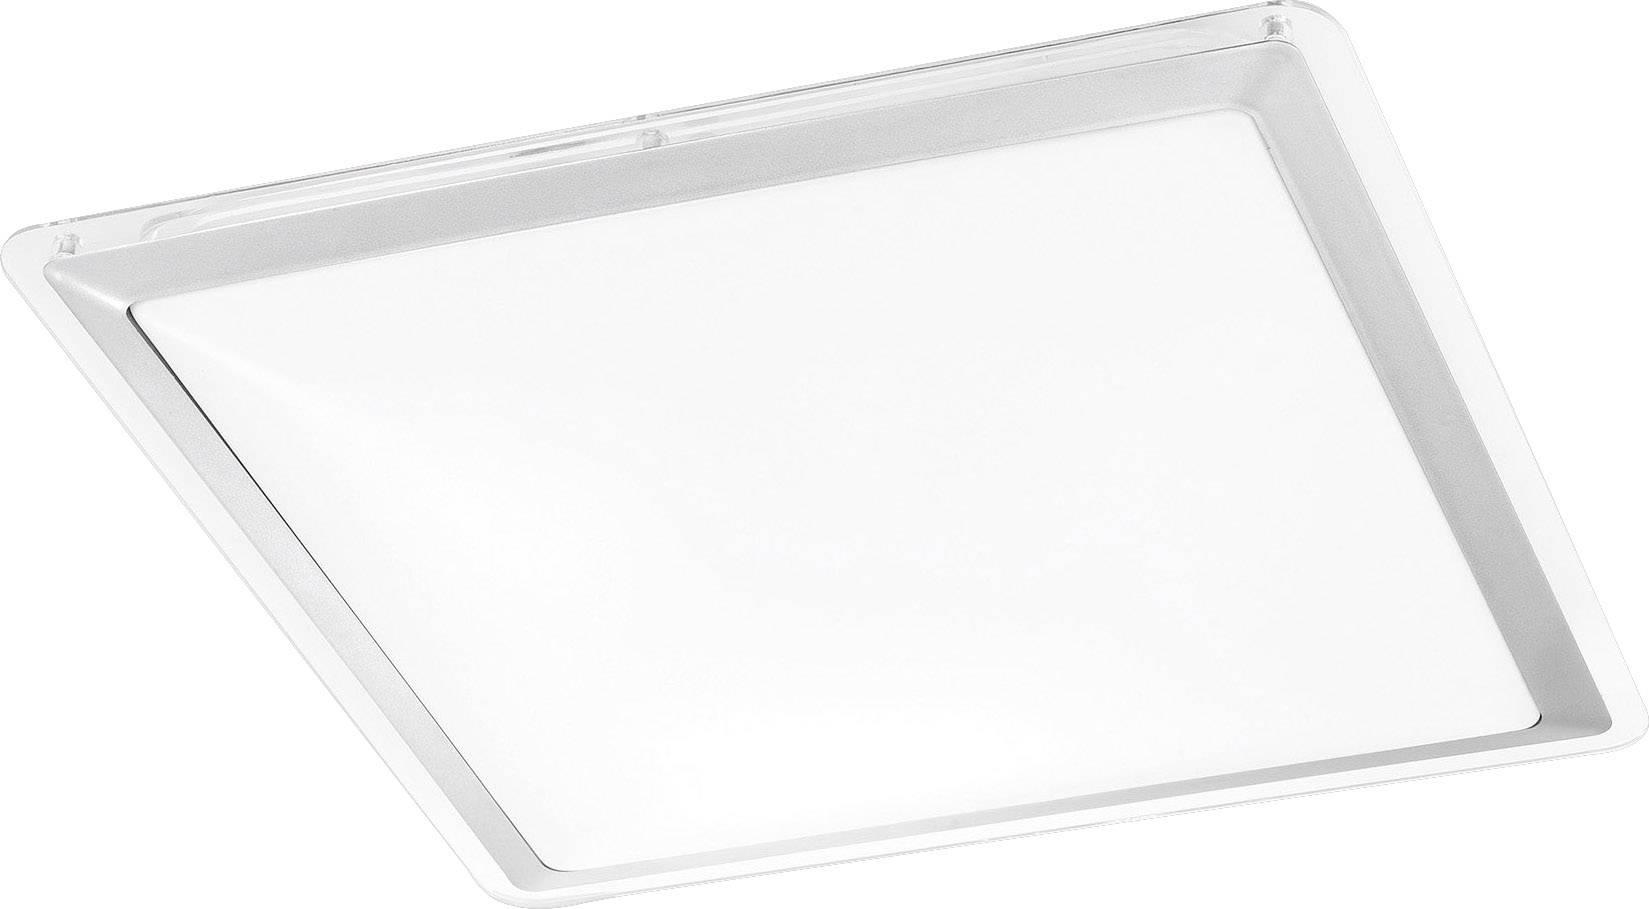 LED-plafondlamp voor badkamer 12 W Warm-wit LeuchtenDirekt 14267 ...